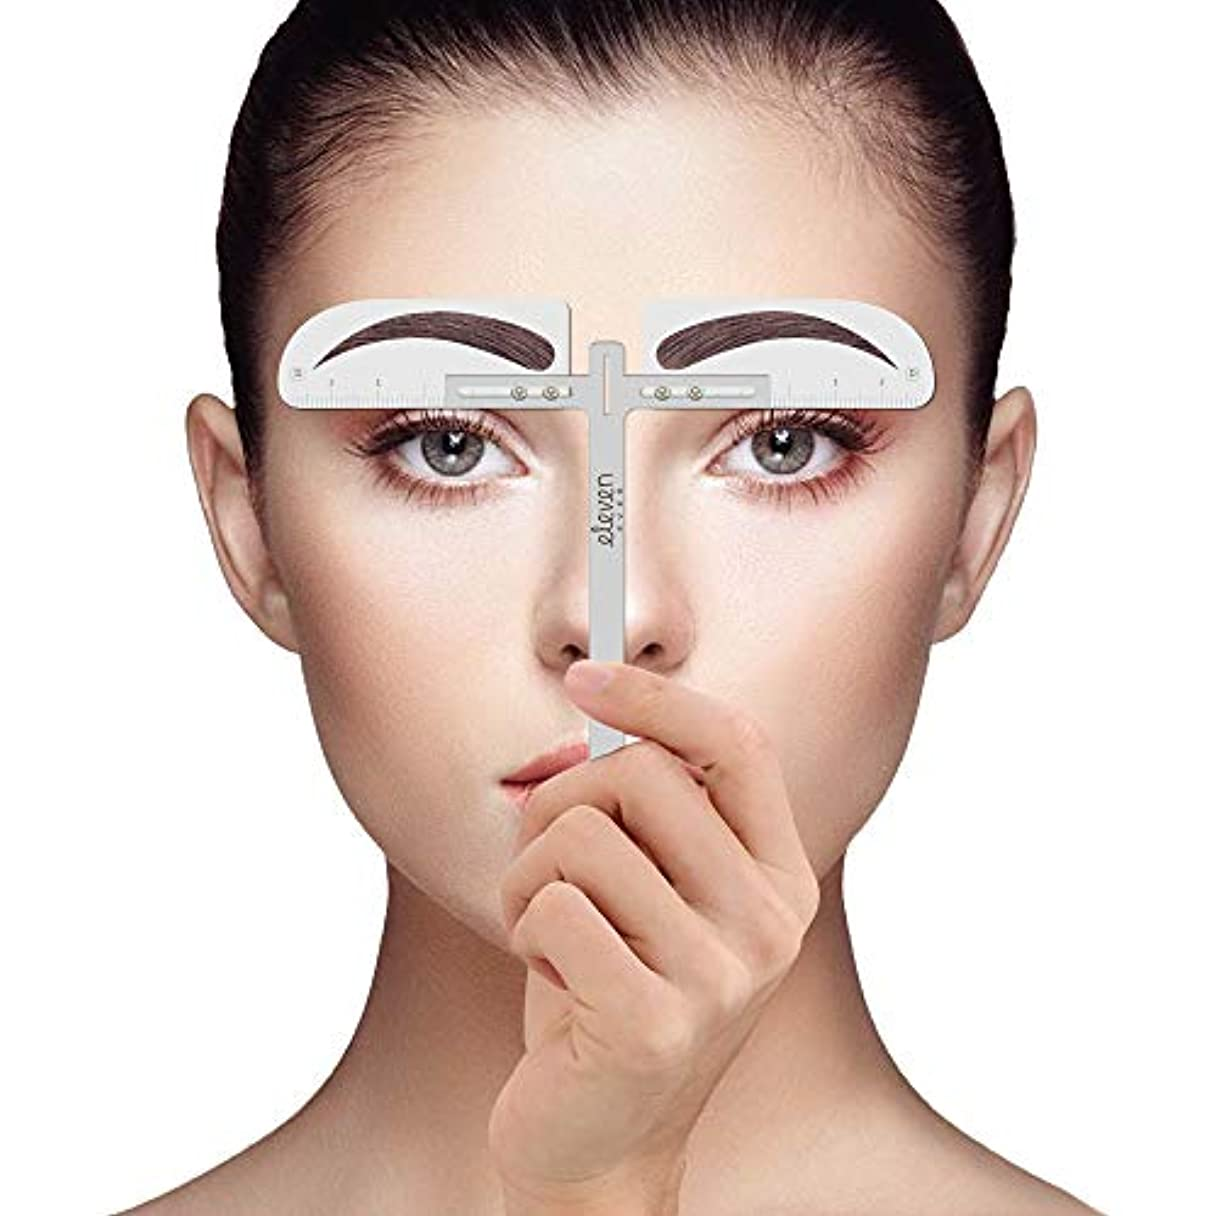 ELEVEN EVER眉毛の定規 キット-眉毛のステンシル 化粧入れ墨の眉ツール(淑女)